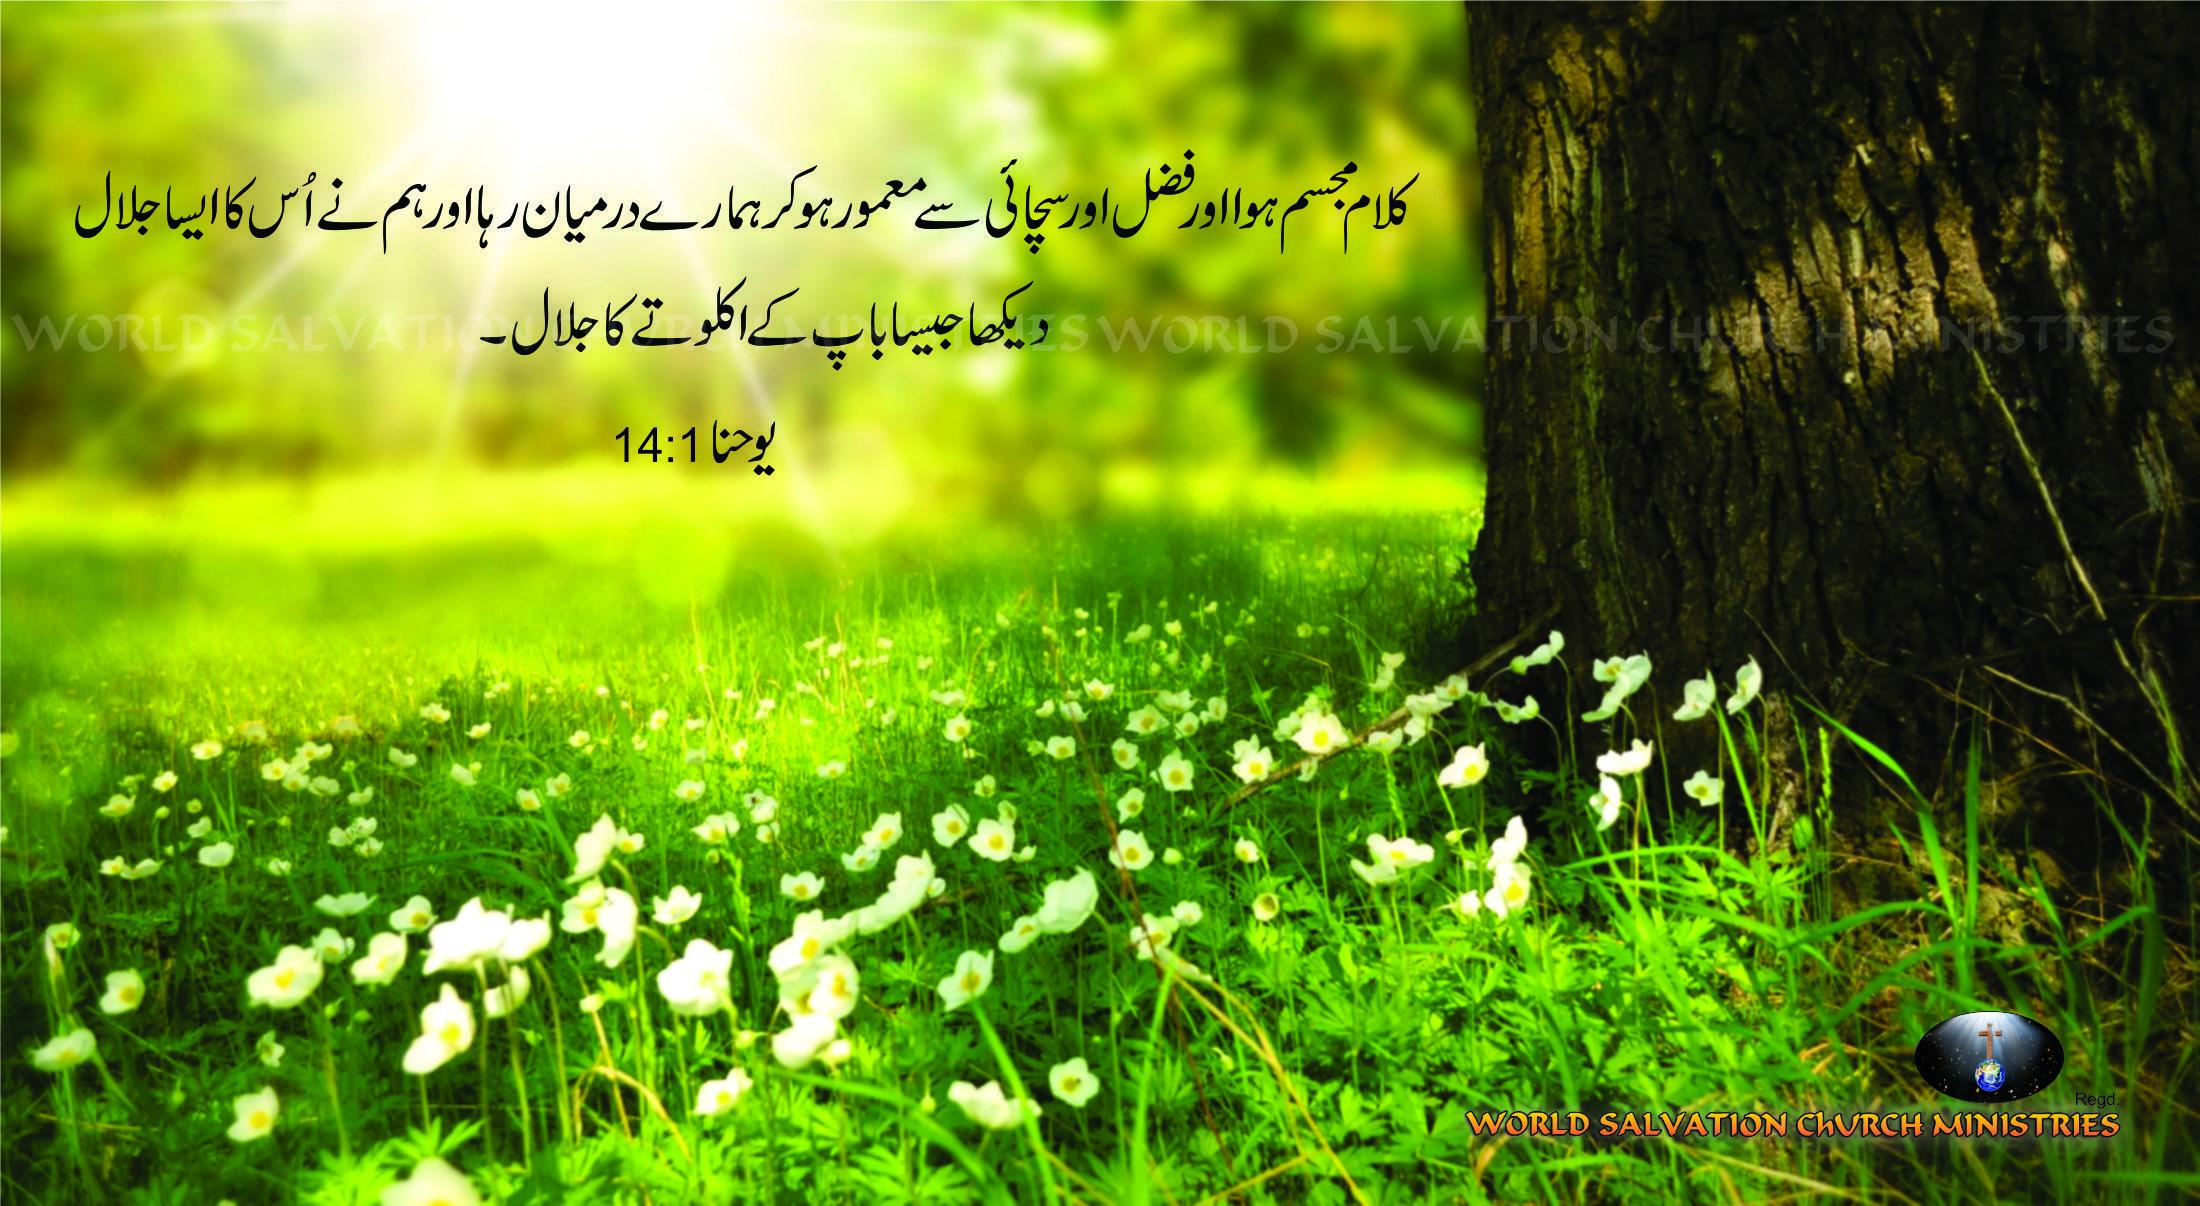 Yohana 1:14 Urdu Bible Verses | Urdu Bible Verses | Bible verses